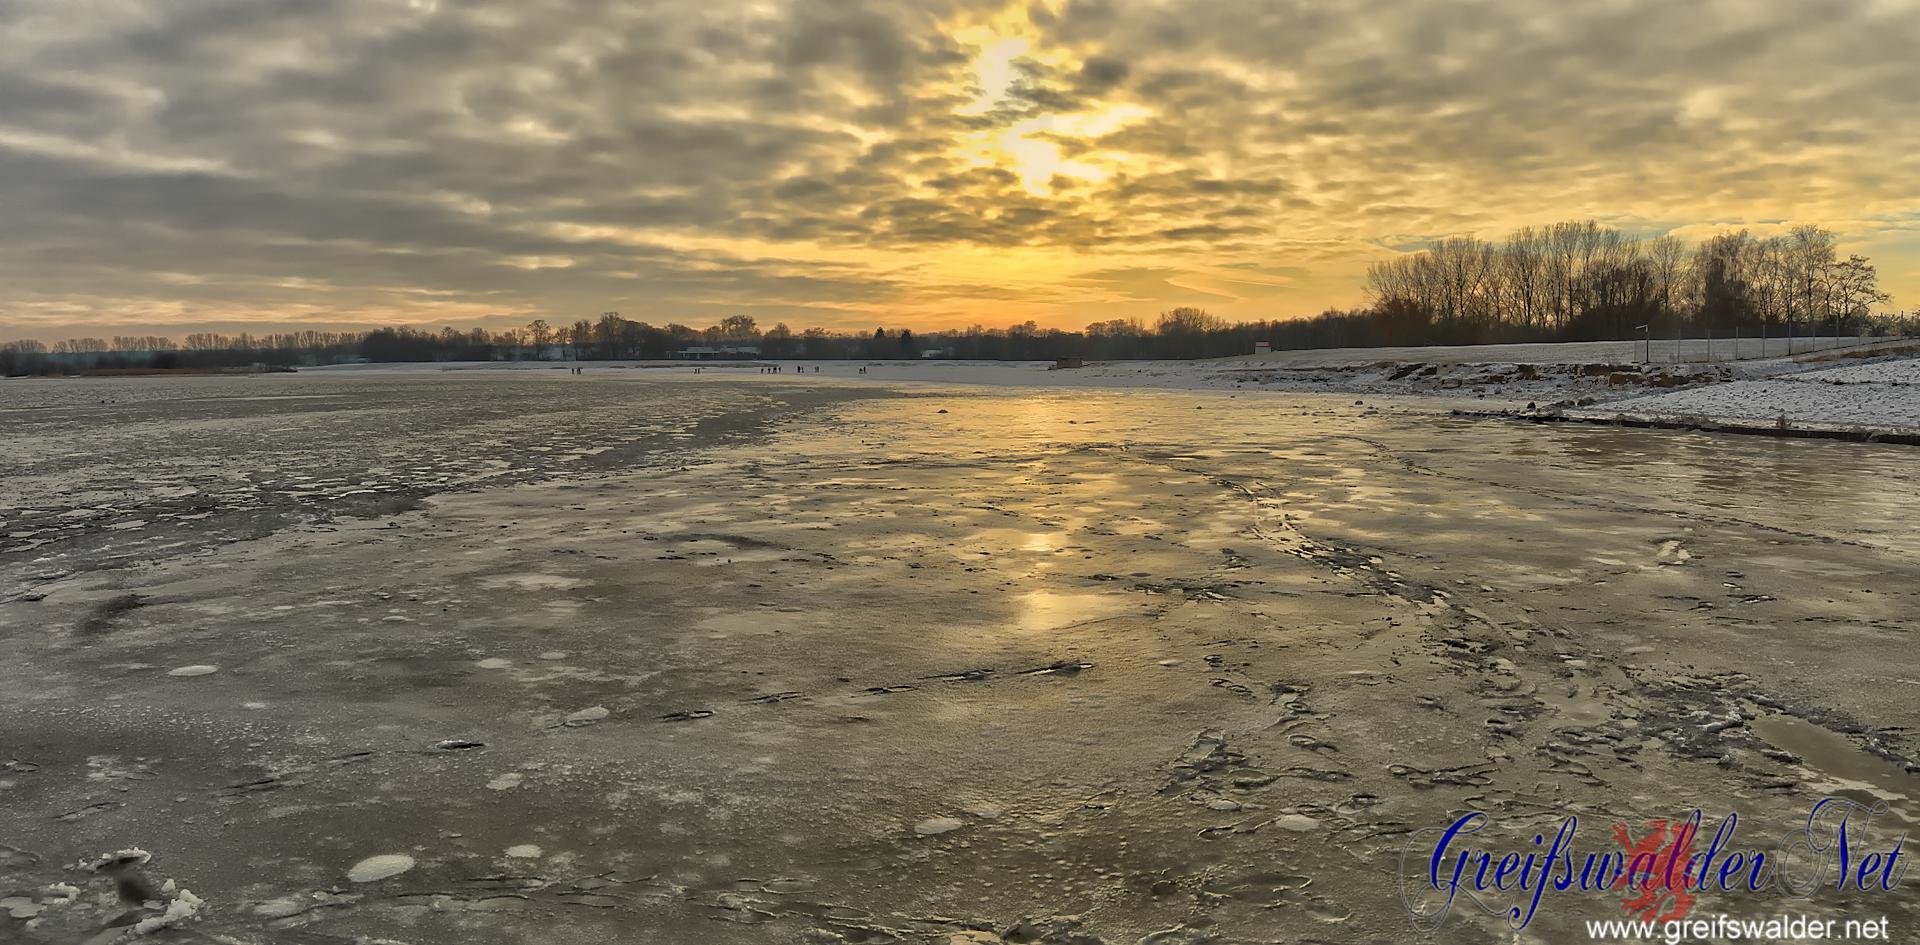 Winter am Strand in Greifswald-Eldena